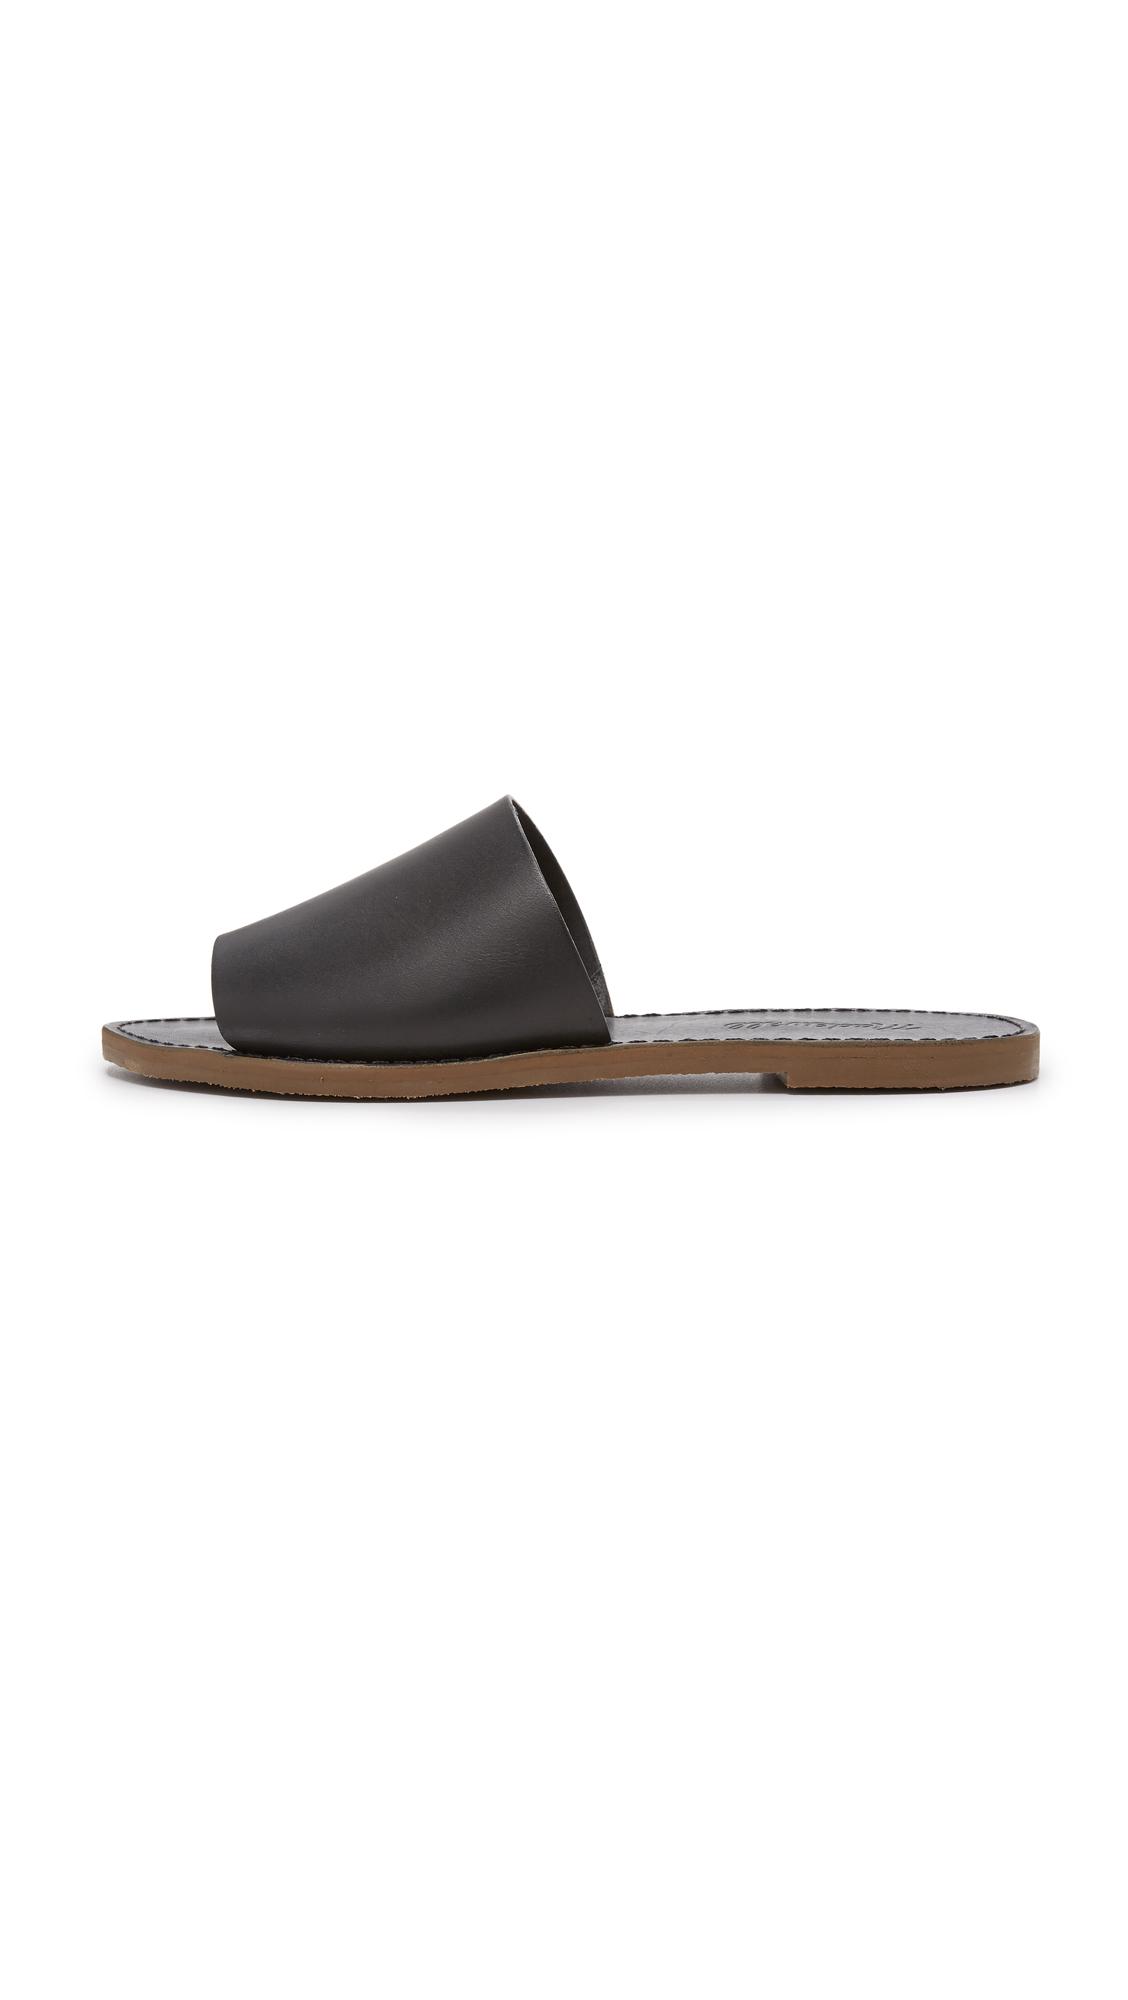 Madewell Madewell Slide Boardwalk Slide Sandals Sandals Shopbop Shopbop Madewell Boardwalk Boardwalk CpSwqa